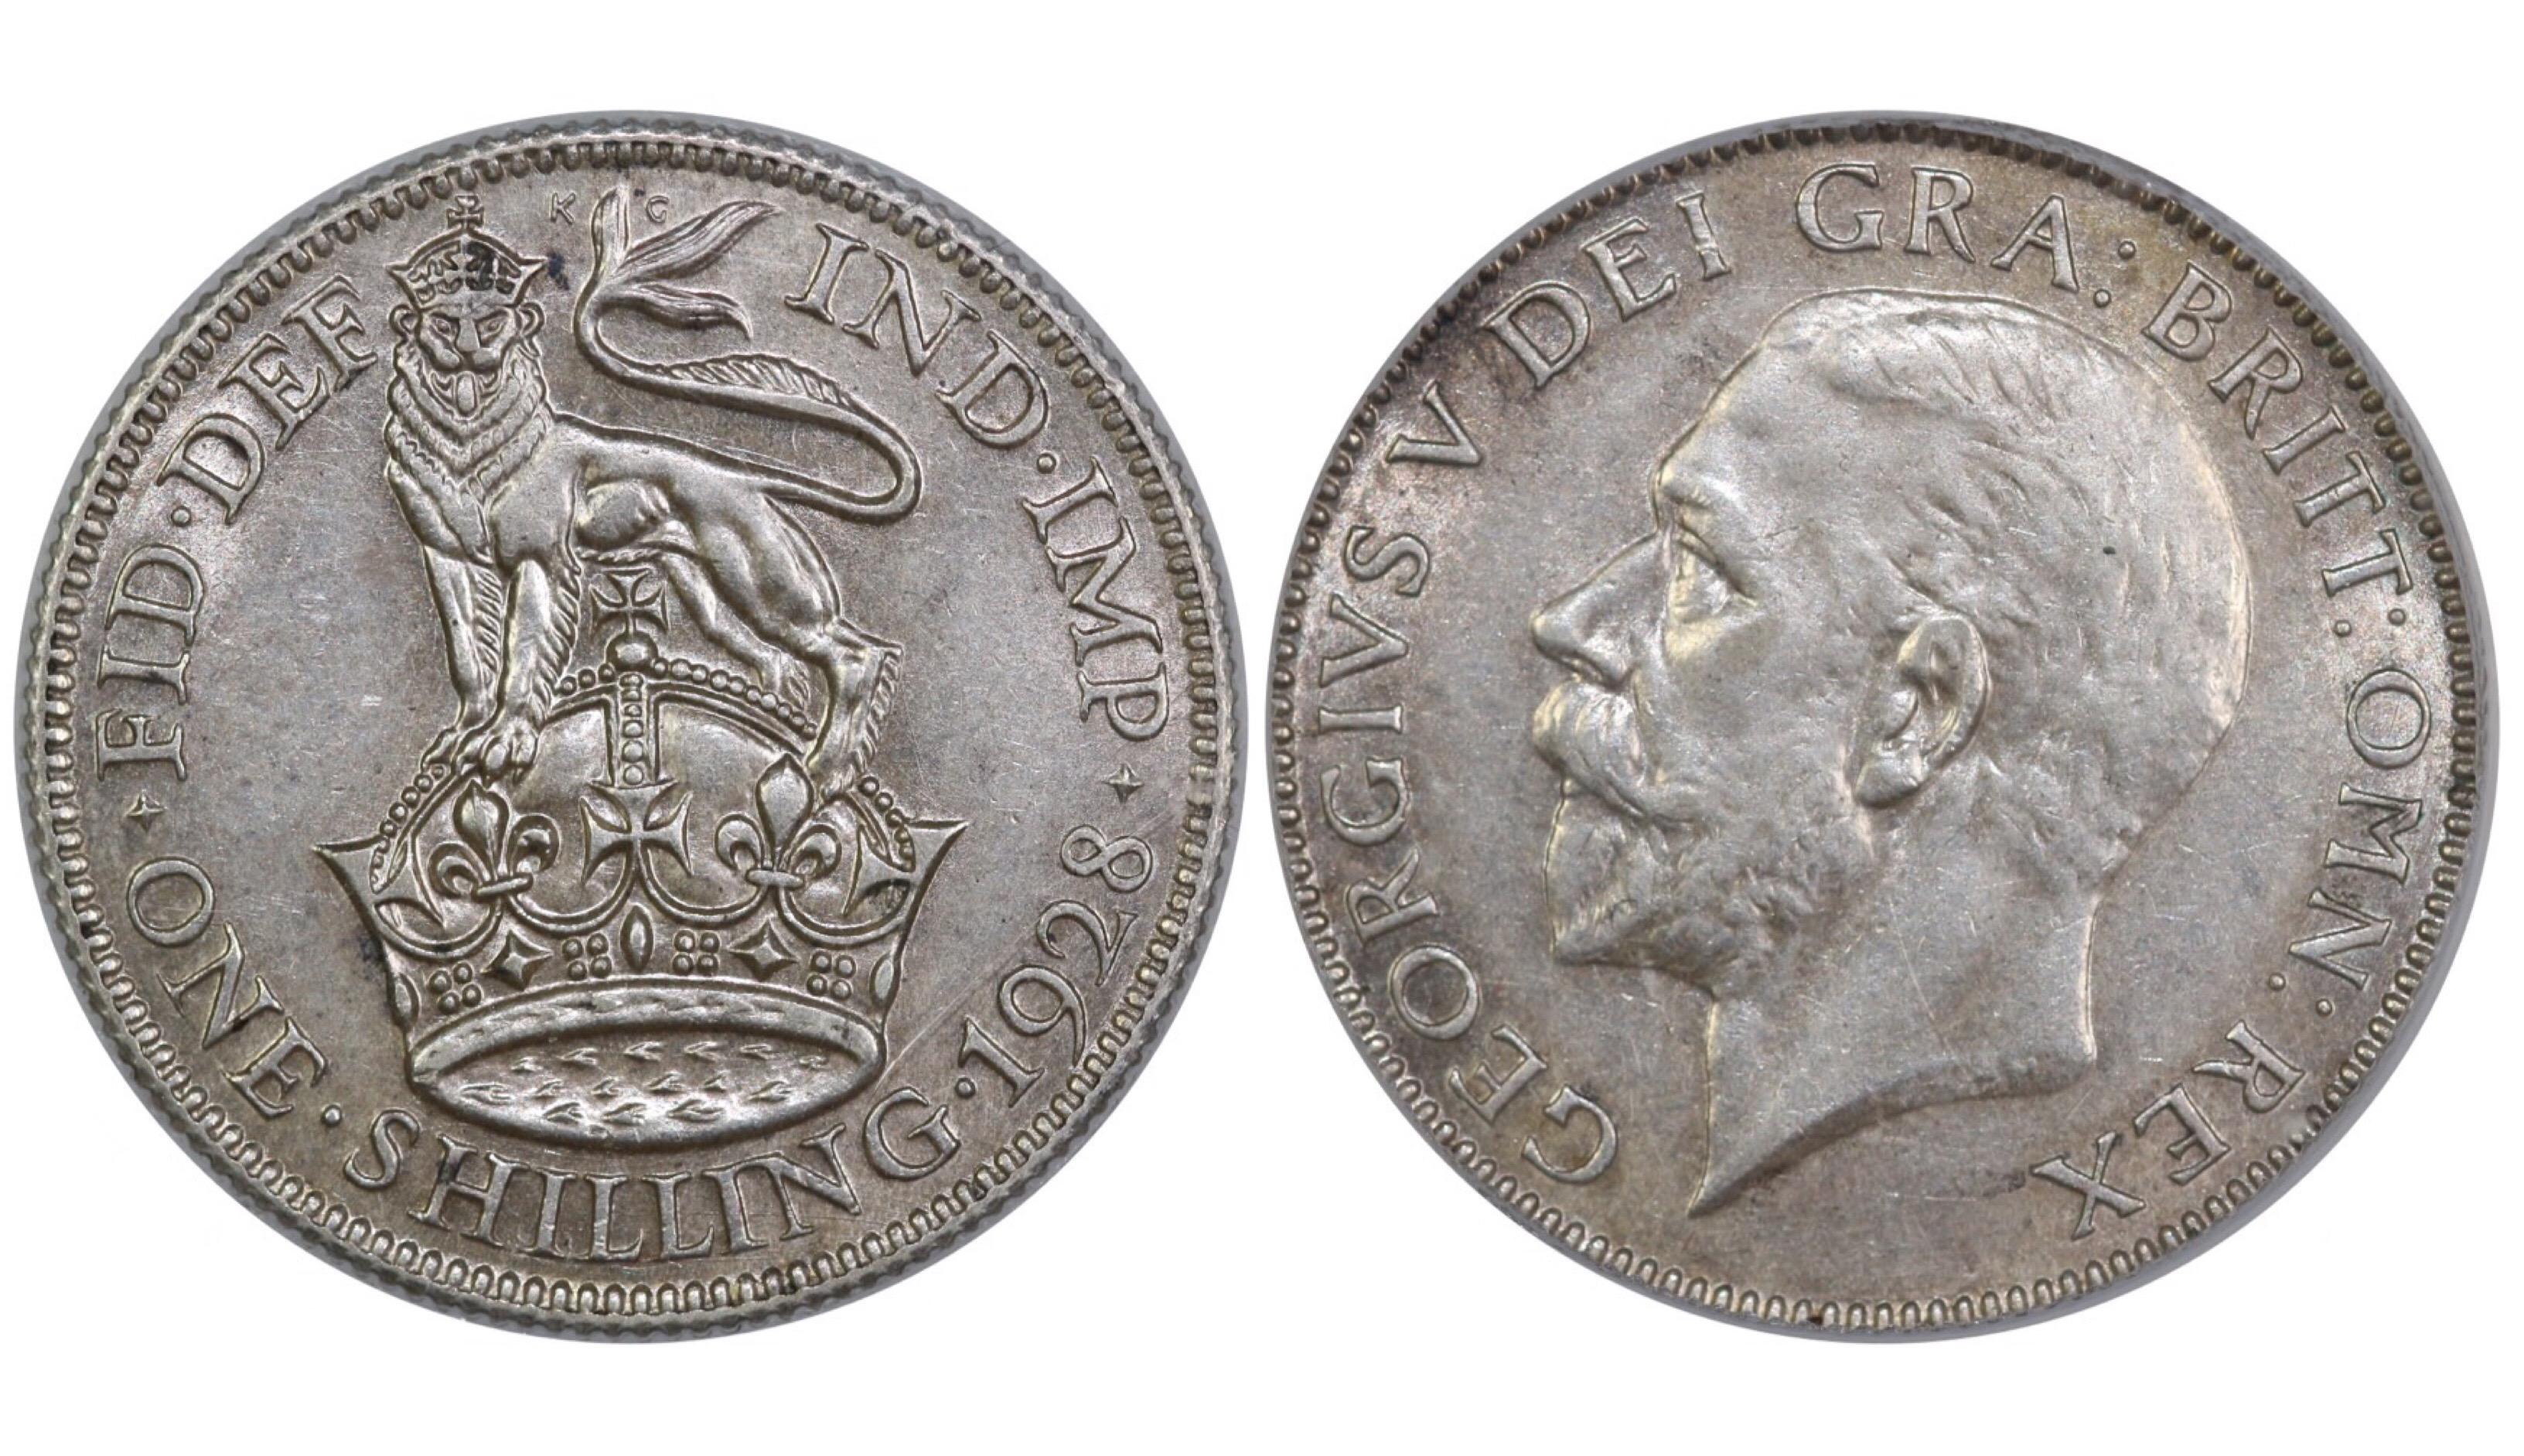 1928 Shilling, CGS 65, George V, ESC 1441, UIN 29056